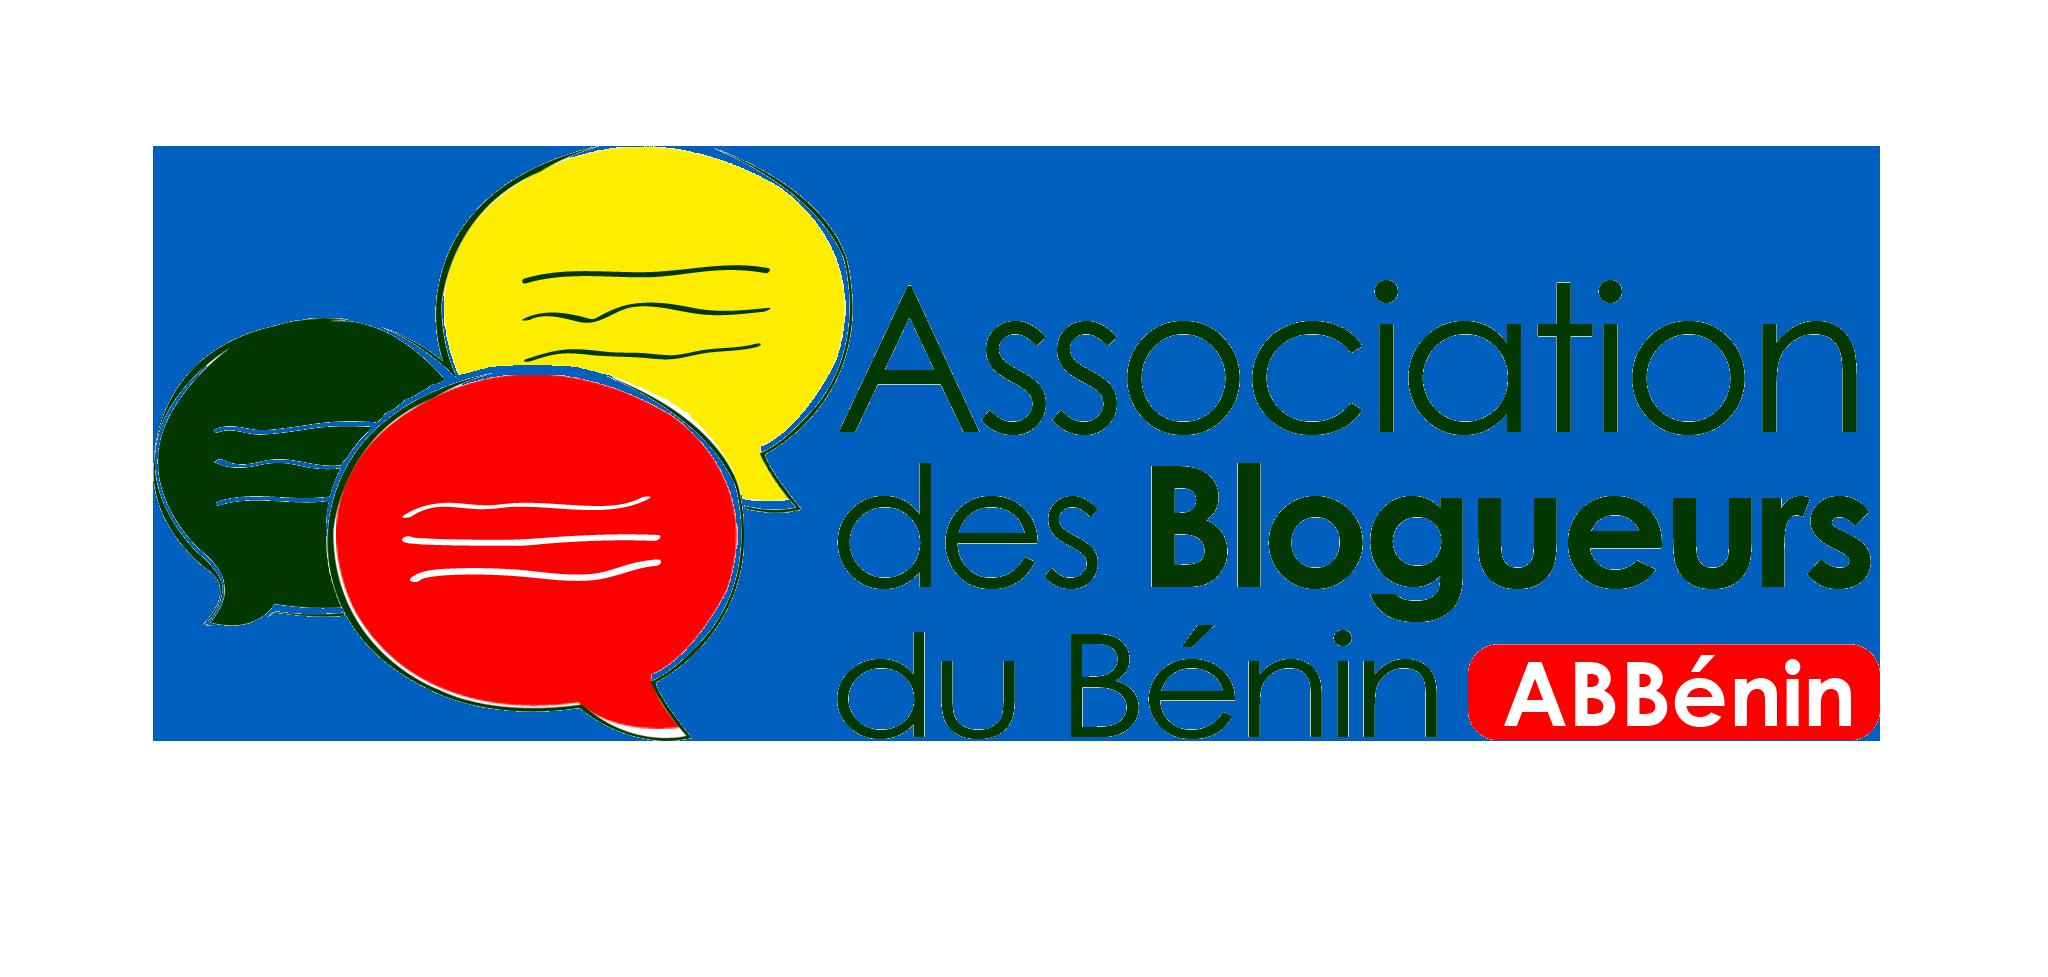 Association des blogueurs du Bénin